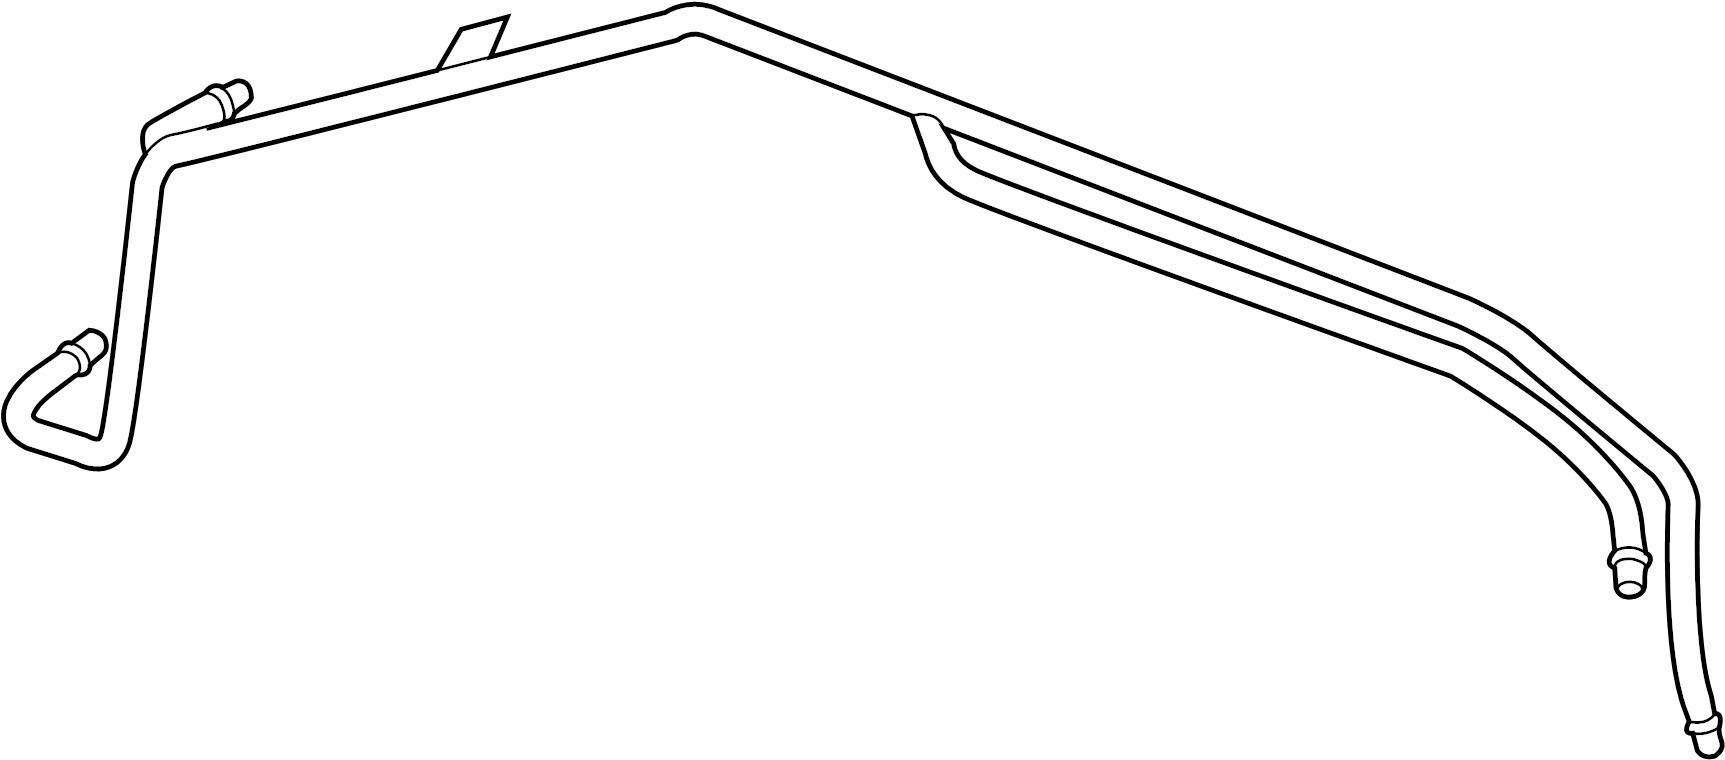 Chevrolet Corvette Automatic Transmission Oil Cooler Tube